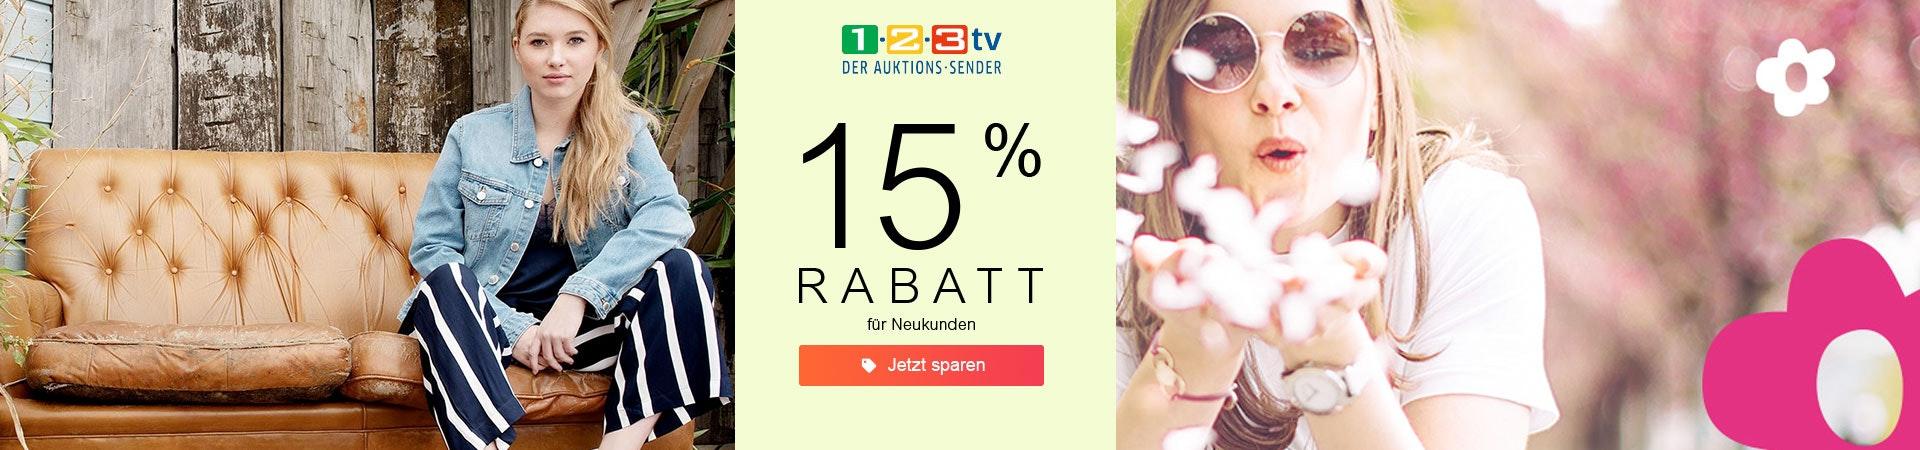 1-2-3.tv 15%